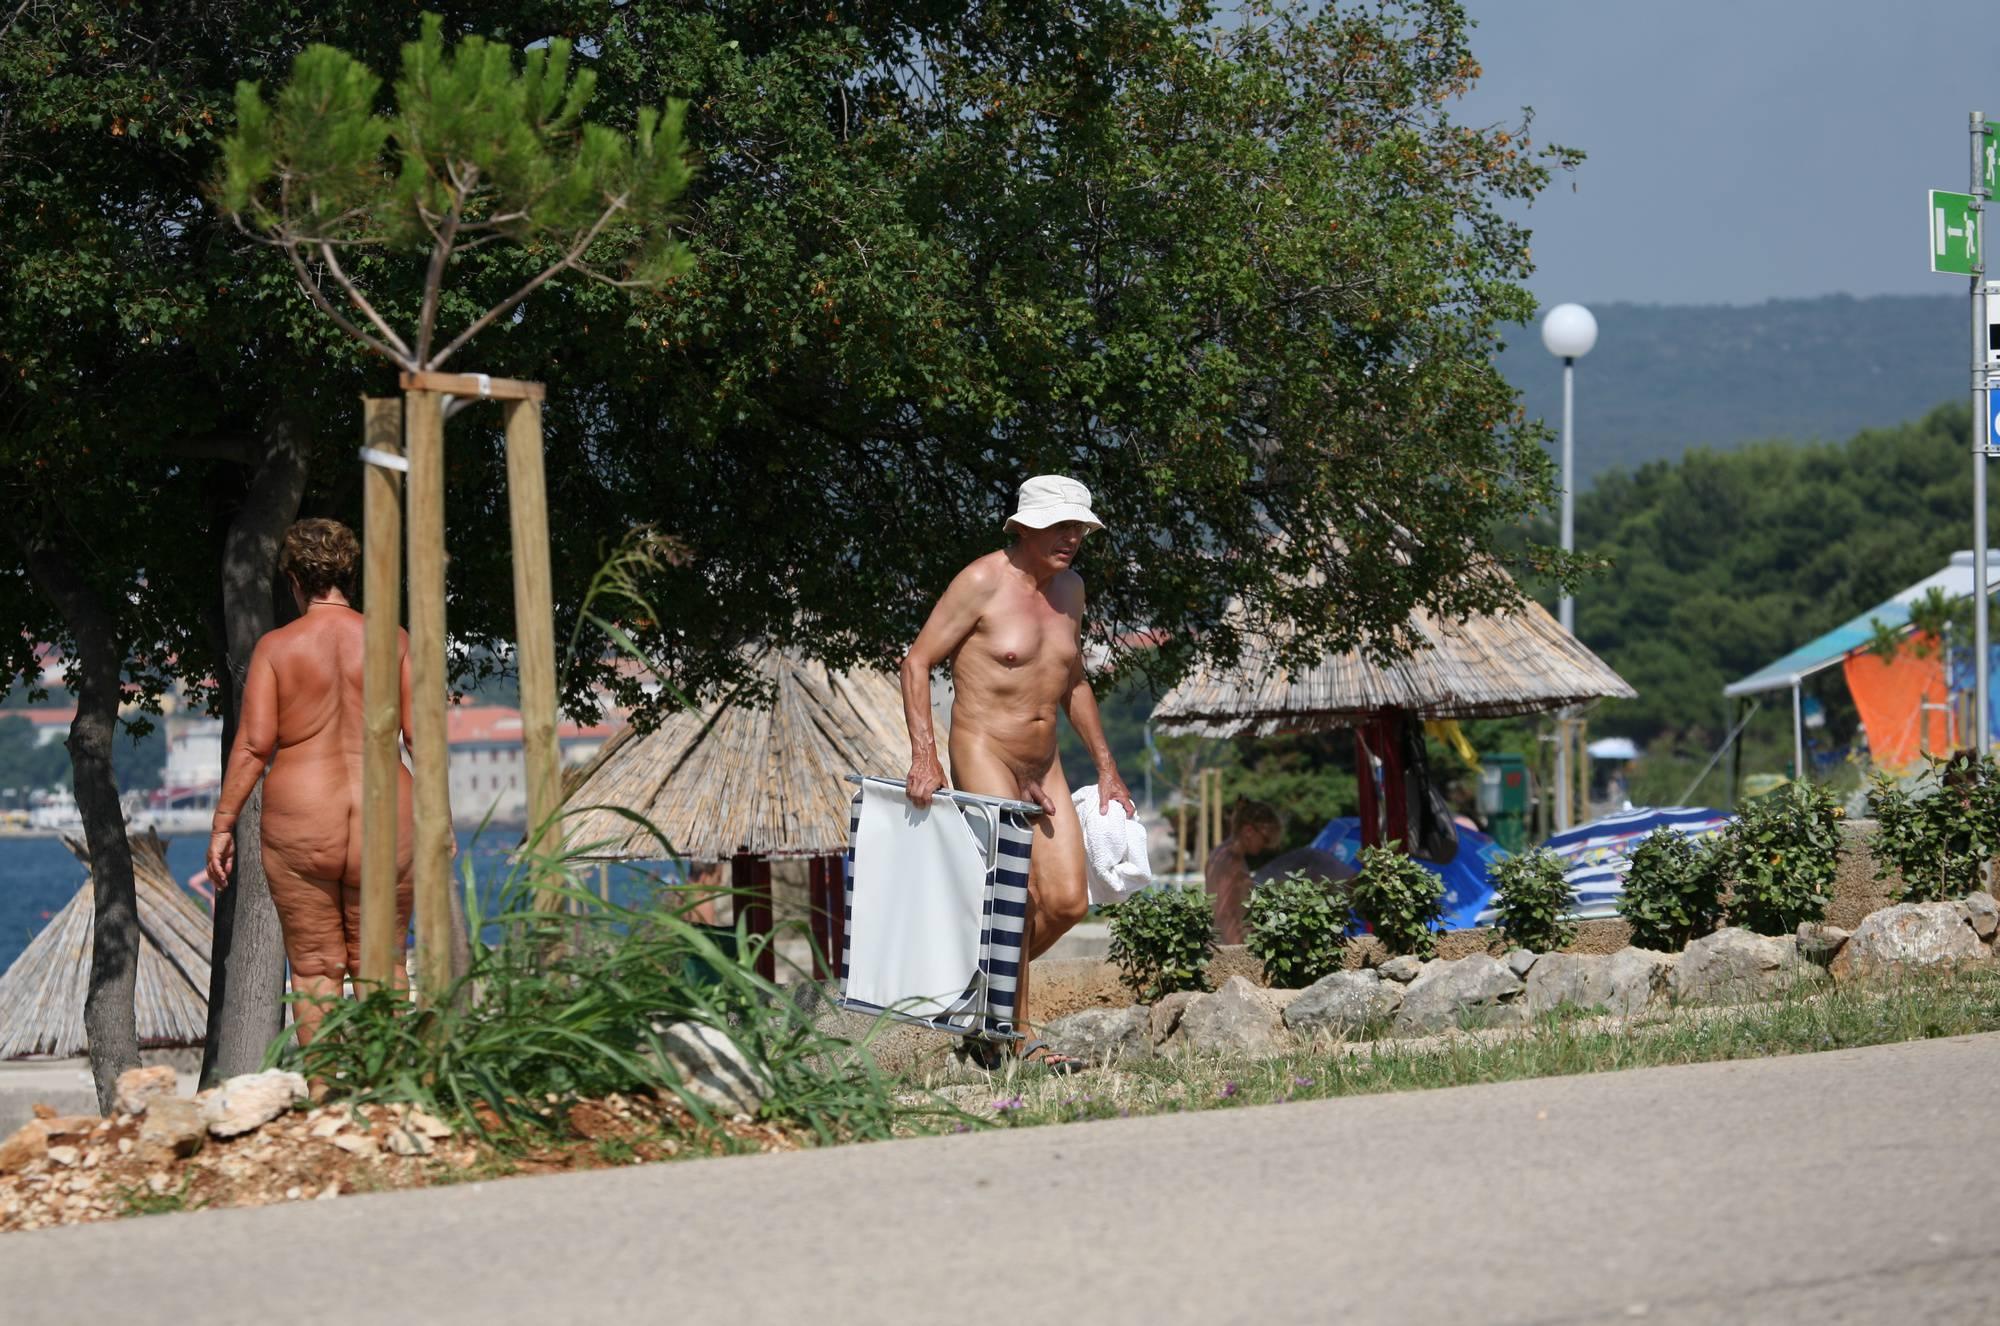 Nudist Gallery Bondi Beach-Park Pass By - 1